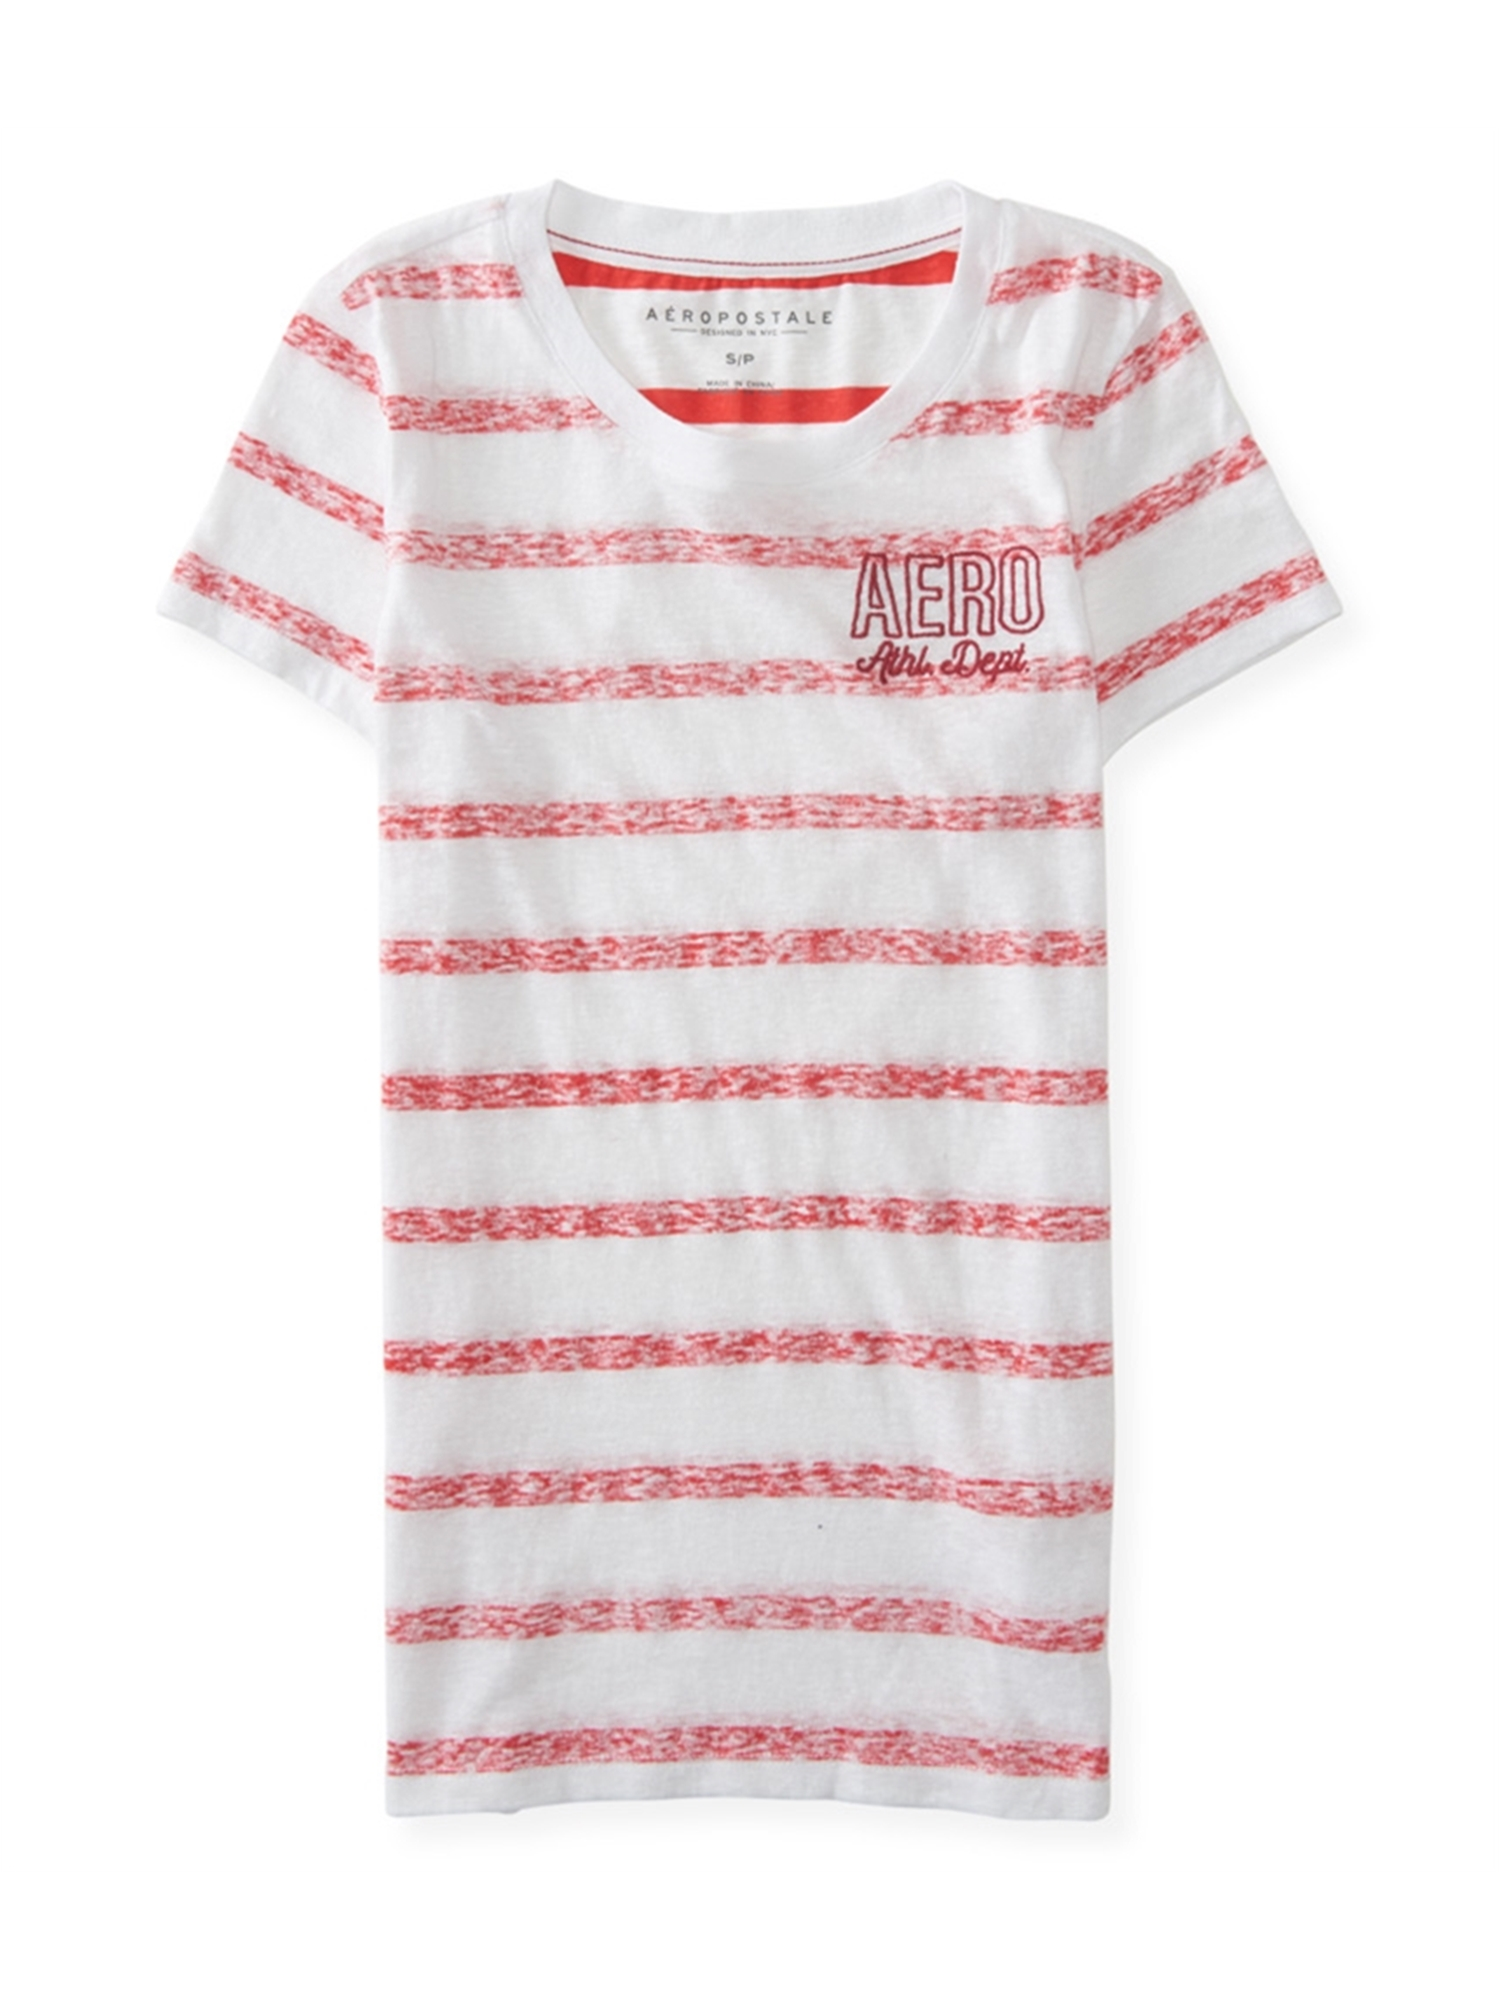 Aeropostale Womens Moon Rise Graphic T-Shirt